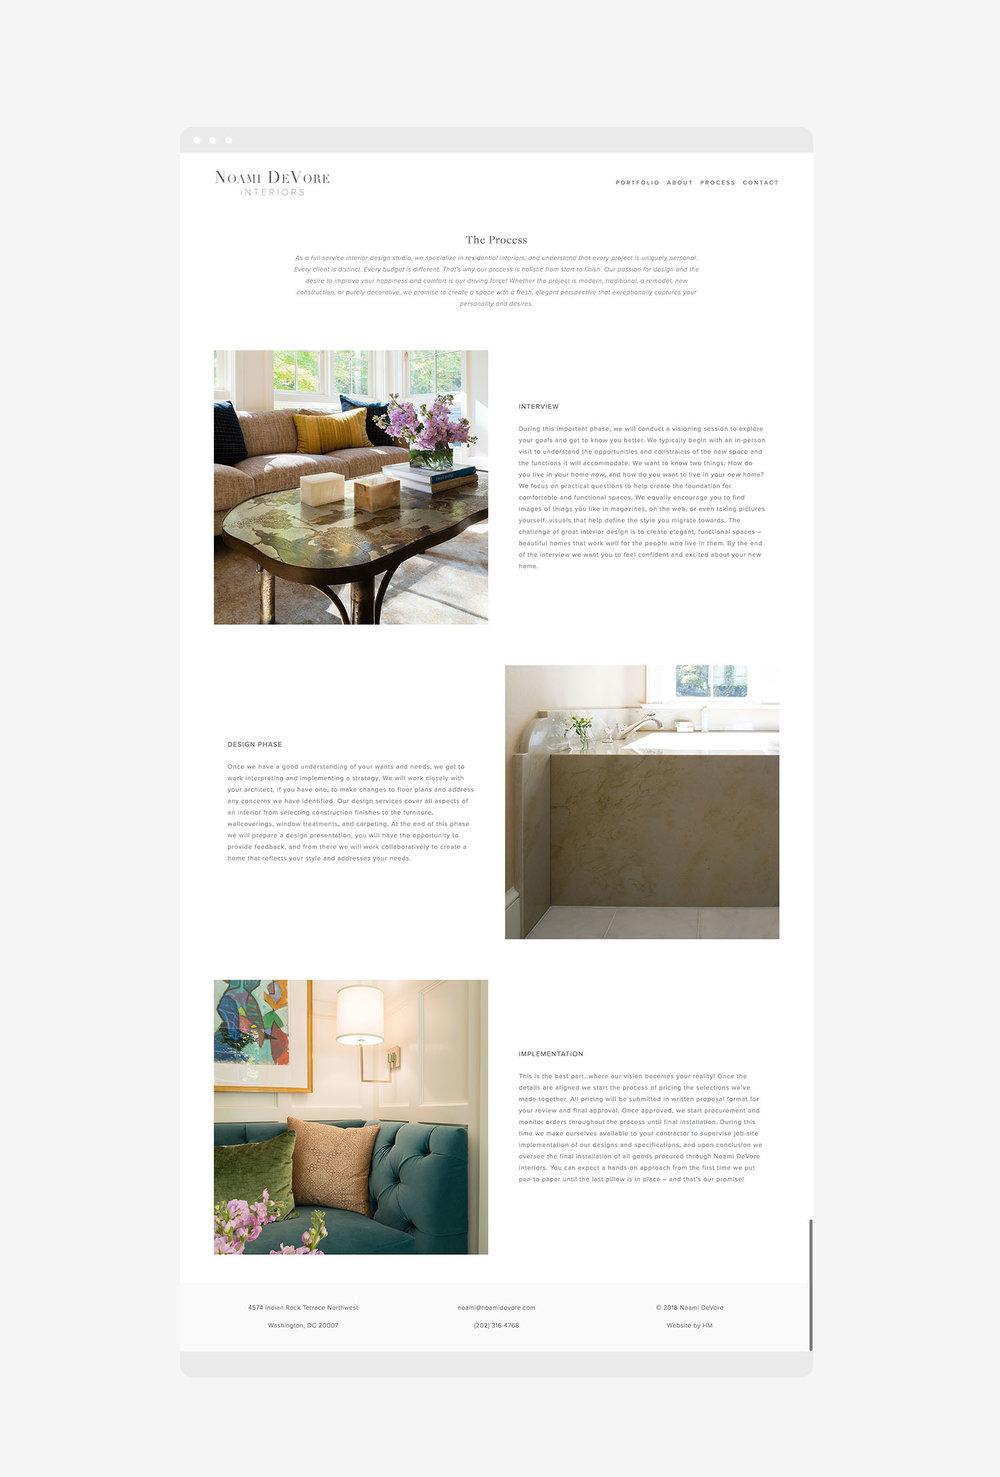 Noami_DeVore_Interiors_Squarespace_Website_Process_Layout_Design_UI_Heather_Maehr_Designer_Portland_Oregon.jpg